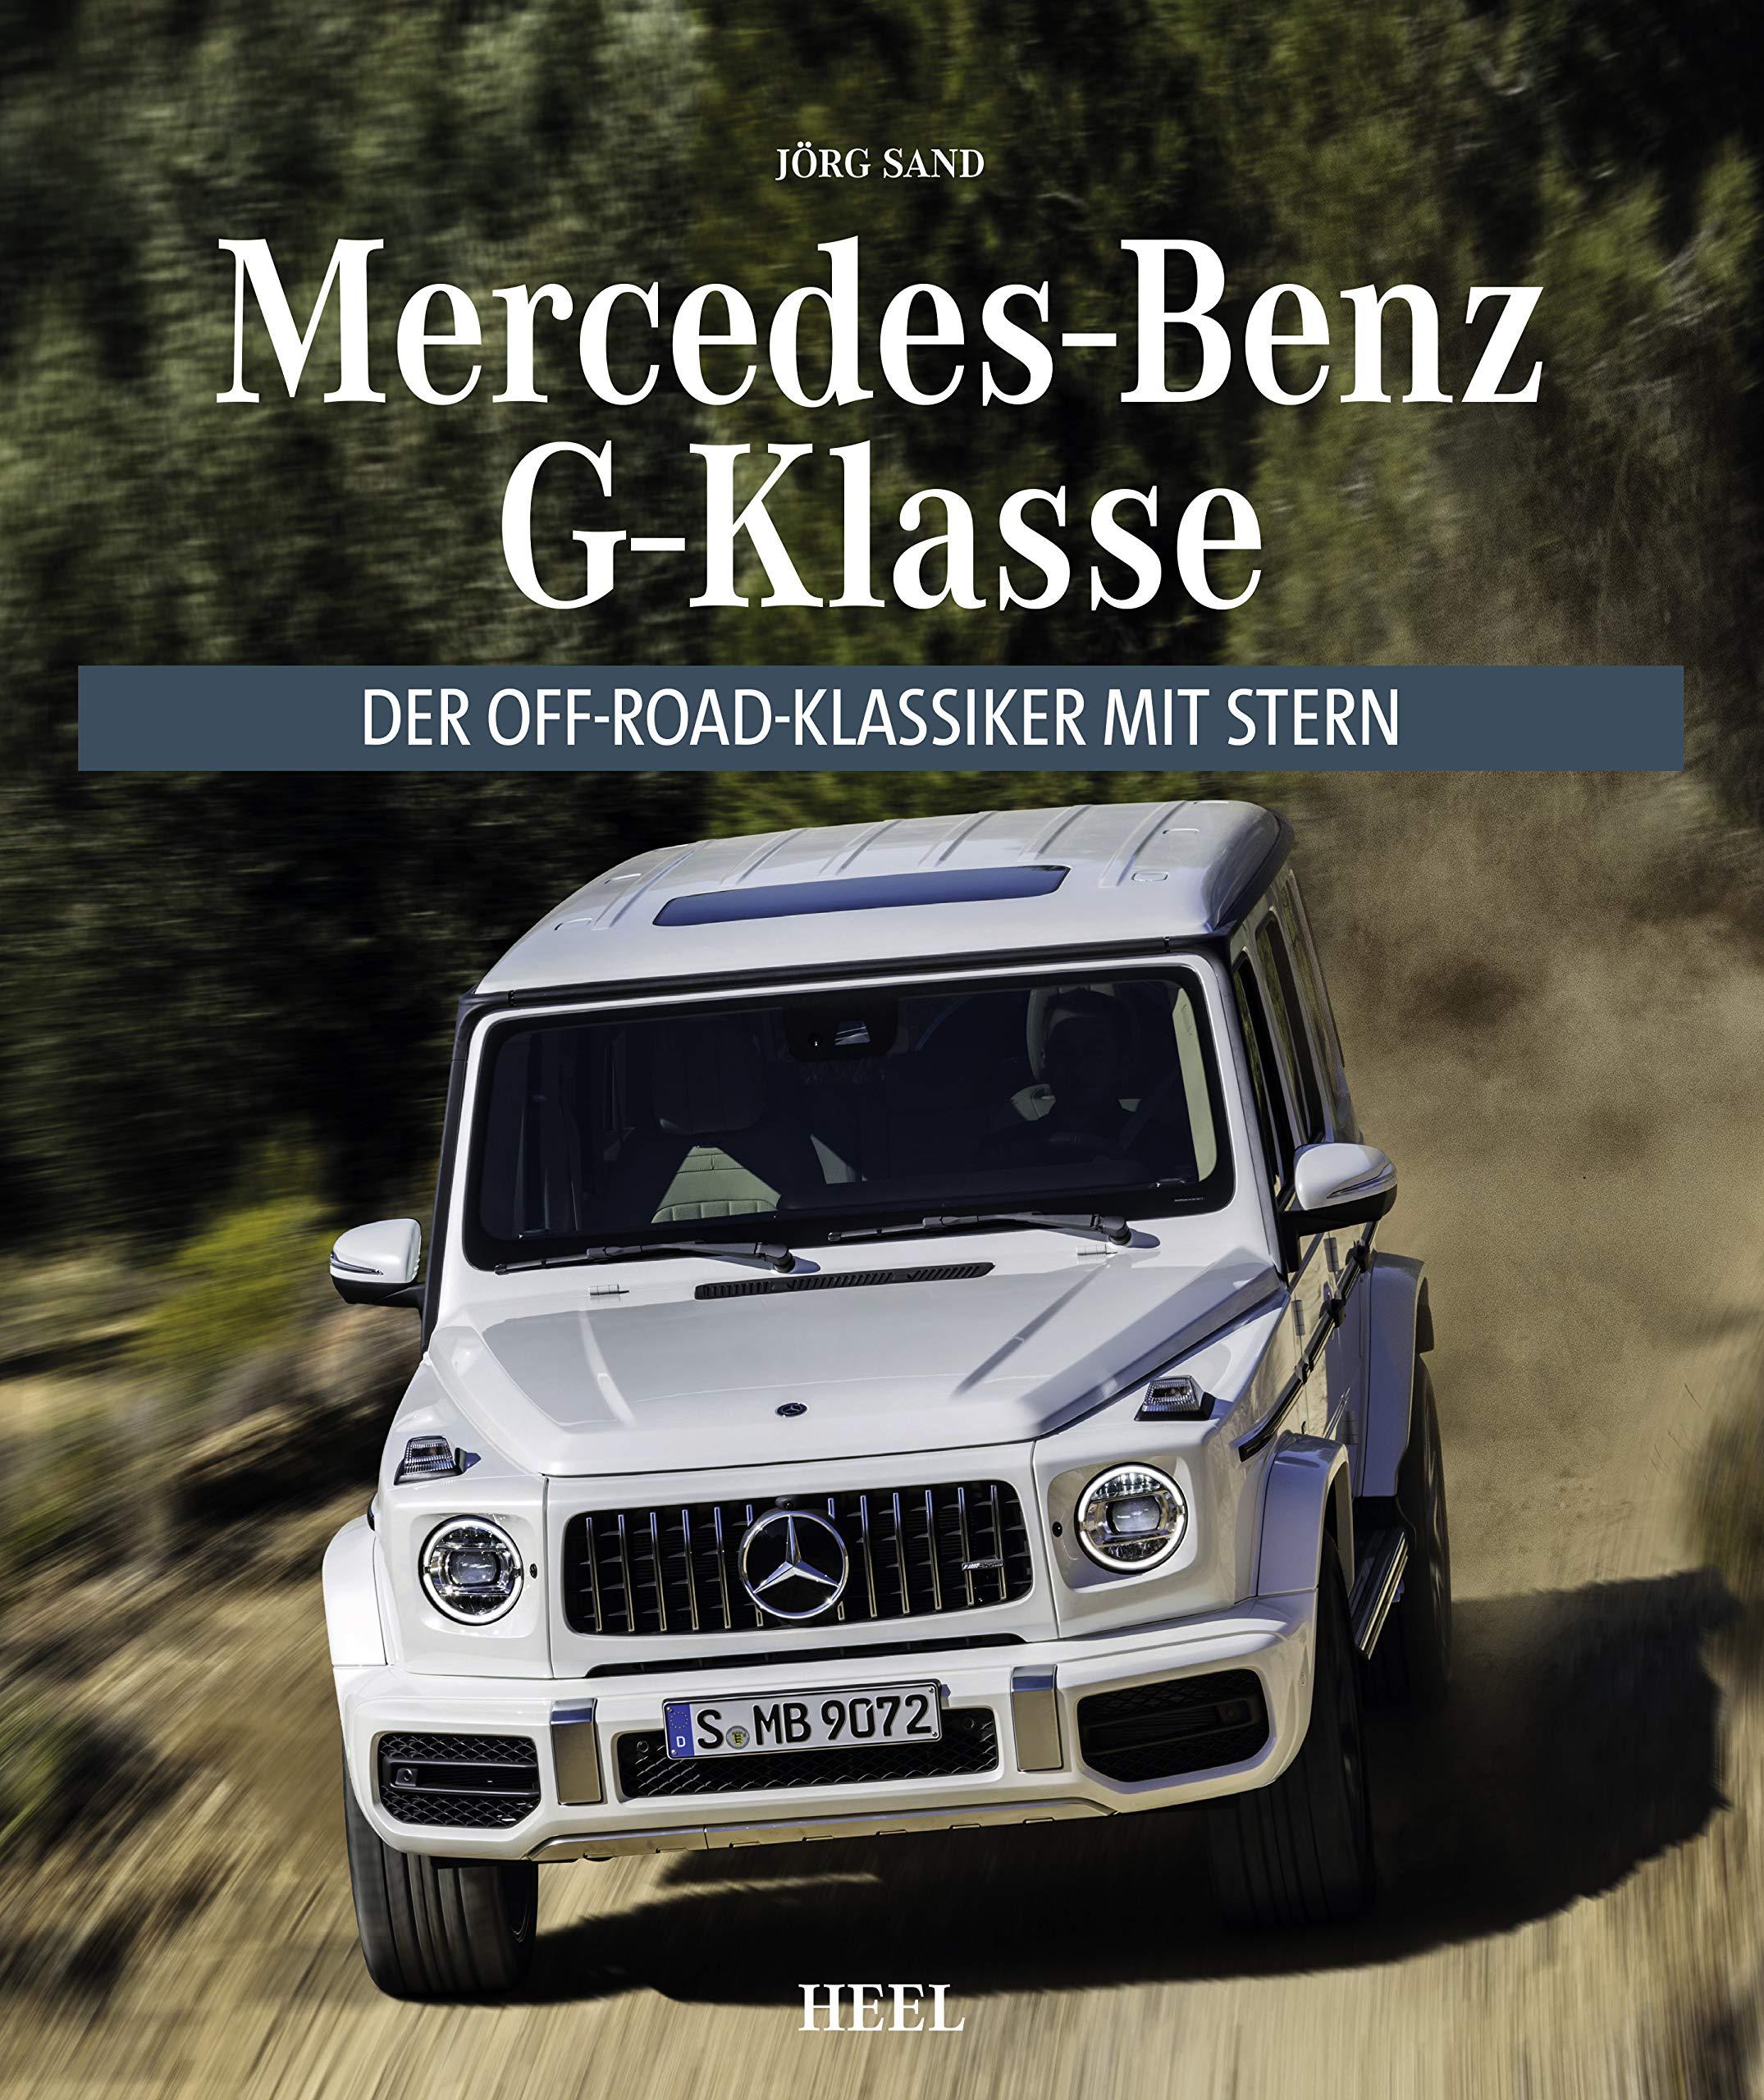 Mercedes Benz G Klasse: Der Off Road Klassiker mit Stern